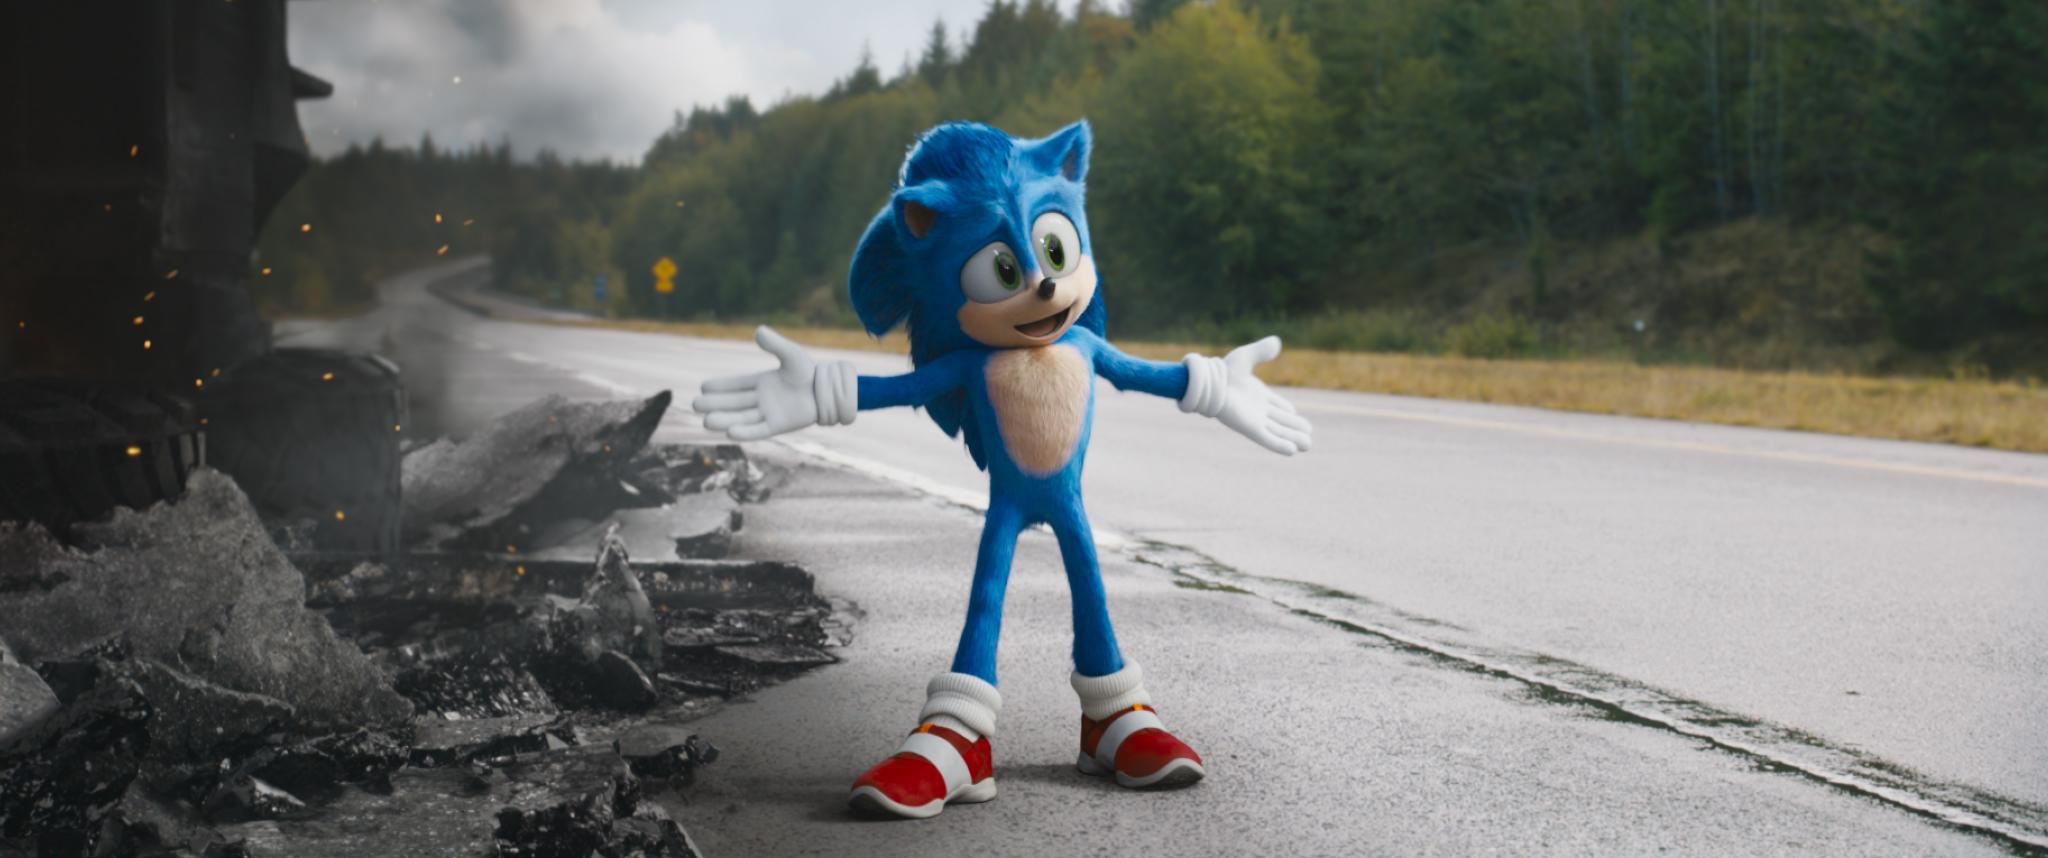 Sonic The Hedgehog 2020 Photo Gallery Imdb